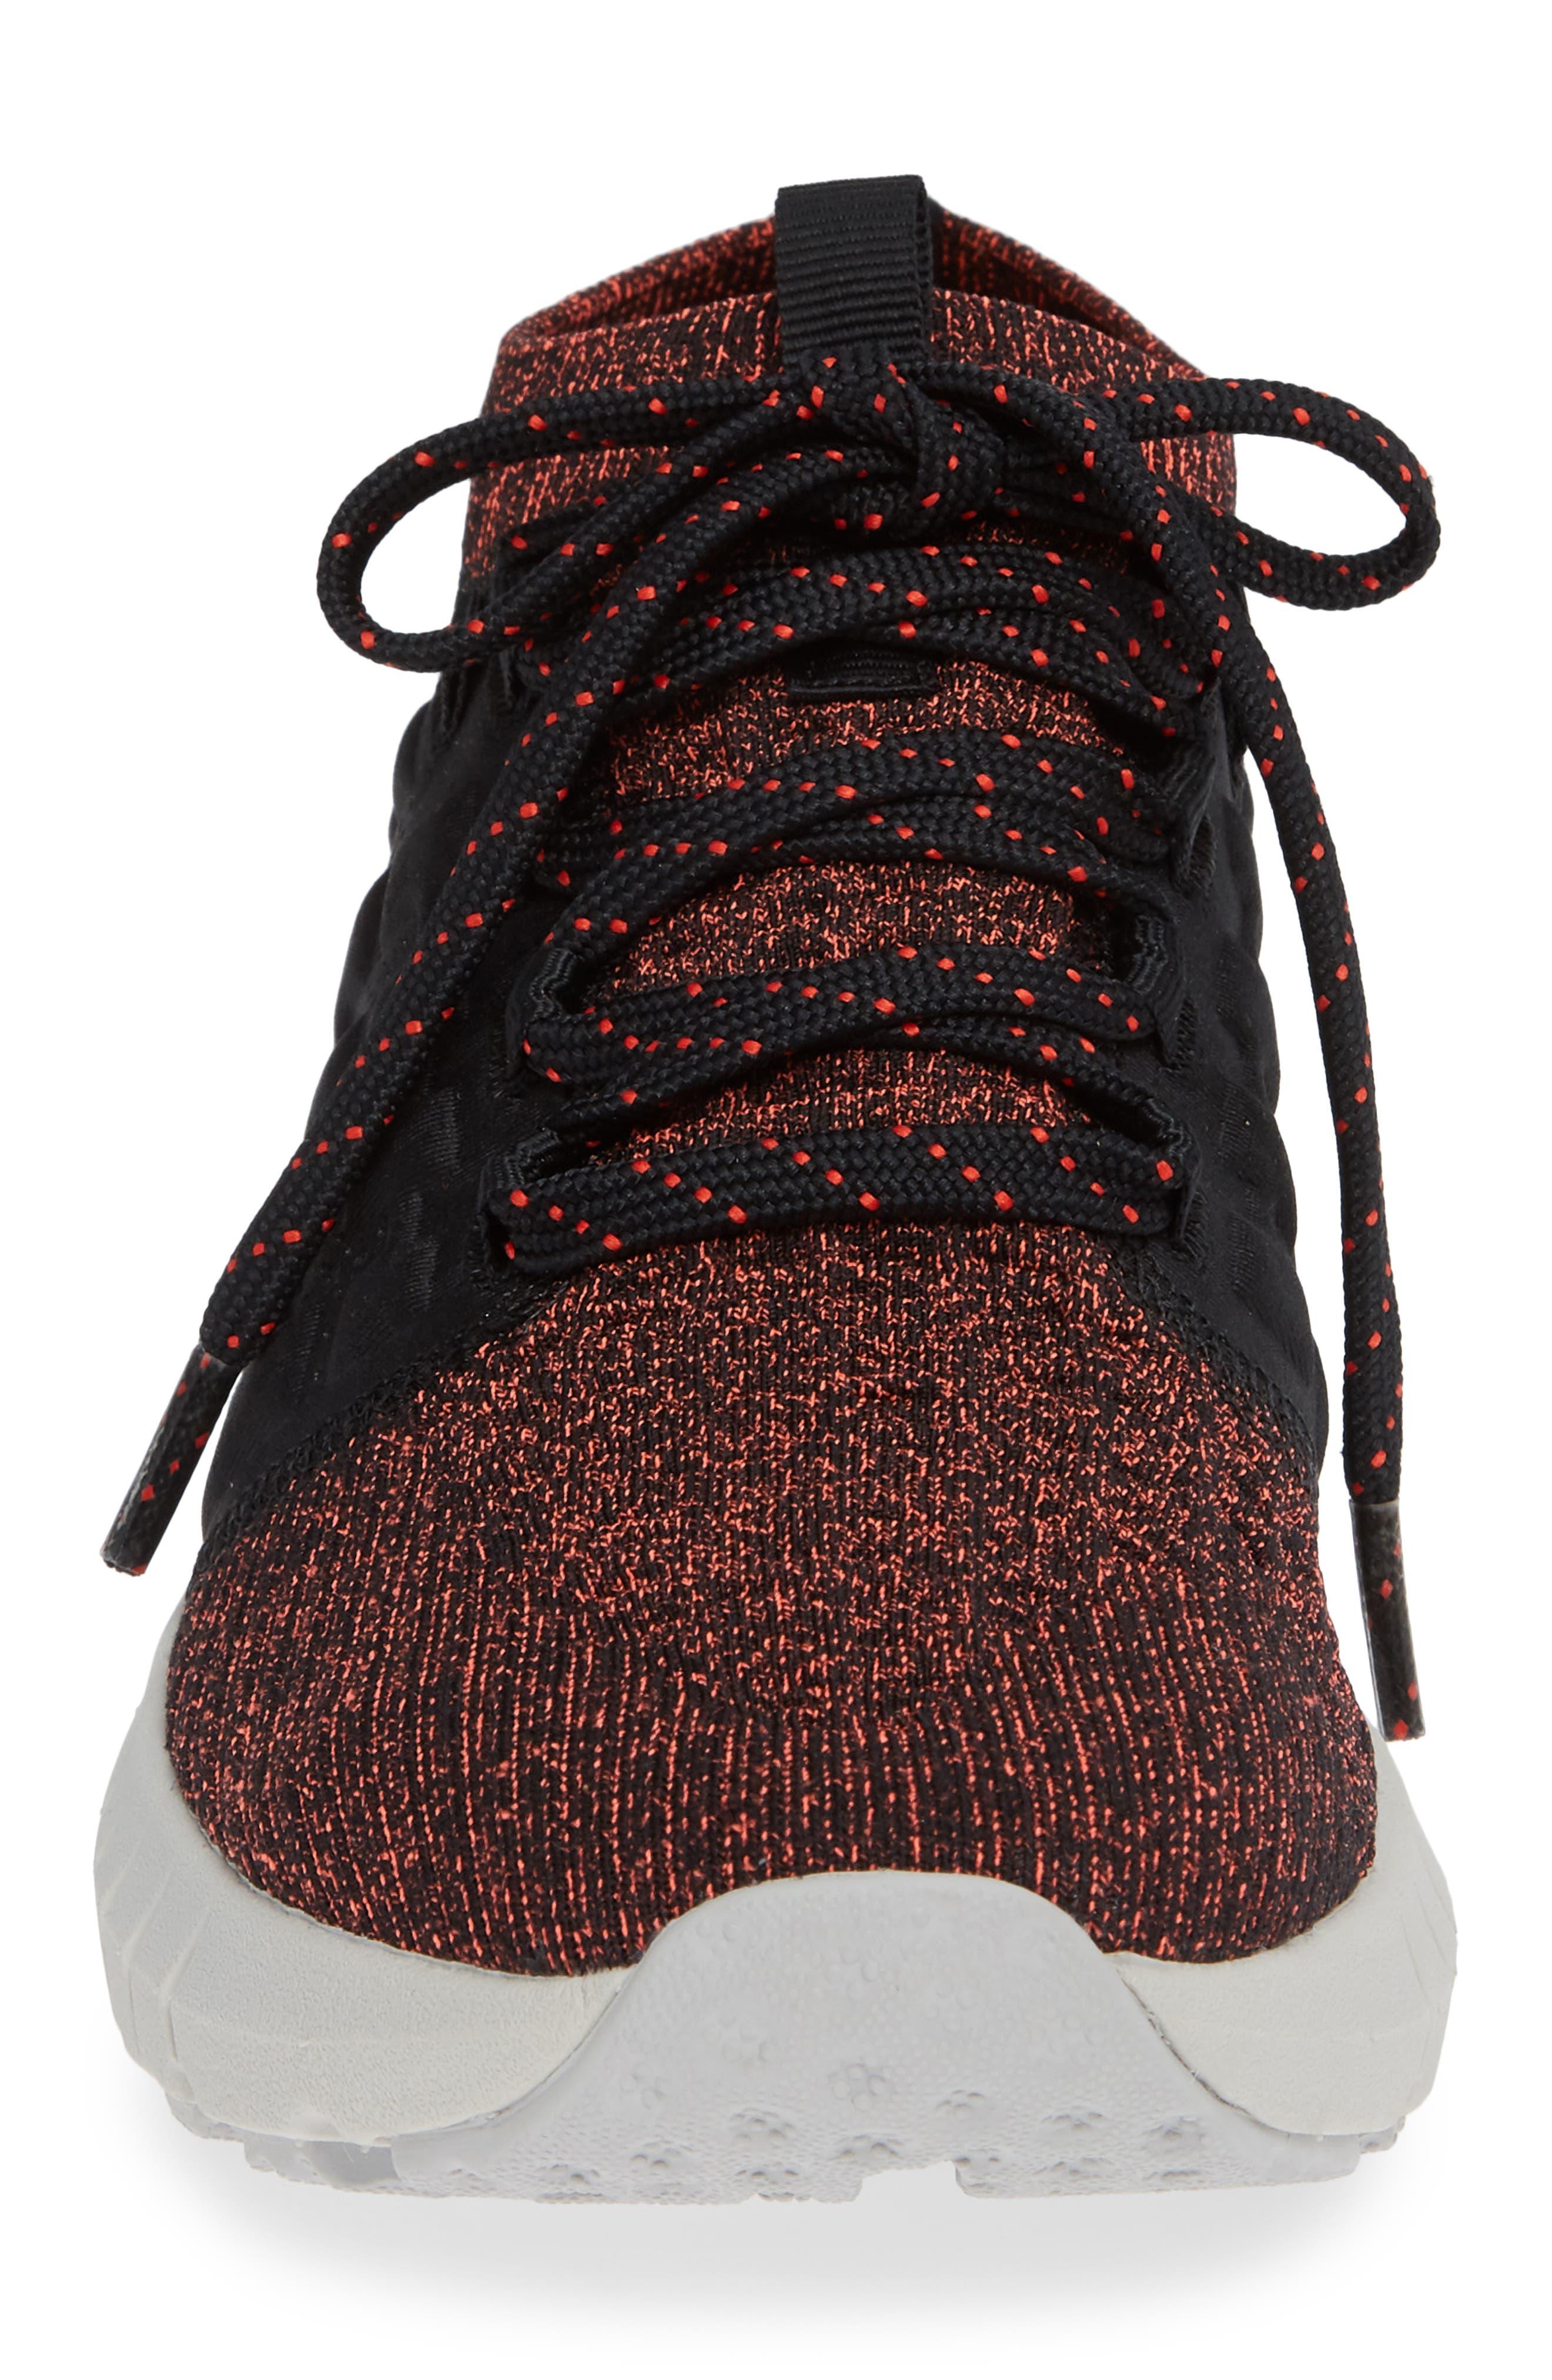 HOVR Phantom NC Sneaker,                             Alternate thumbnail 6, color,                             Black/ Ghost Grey/ Radio Red